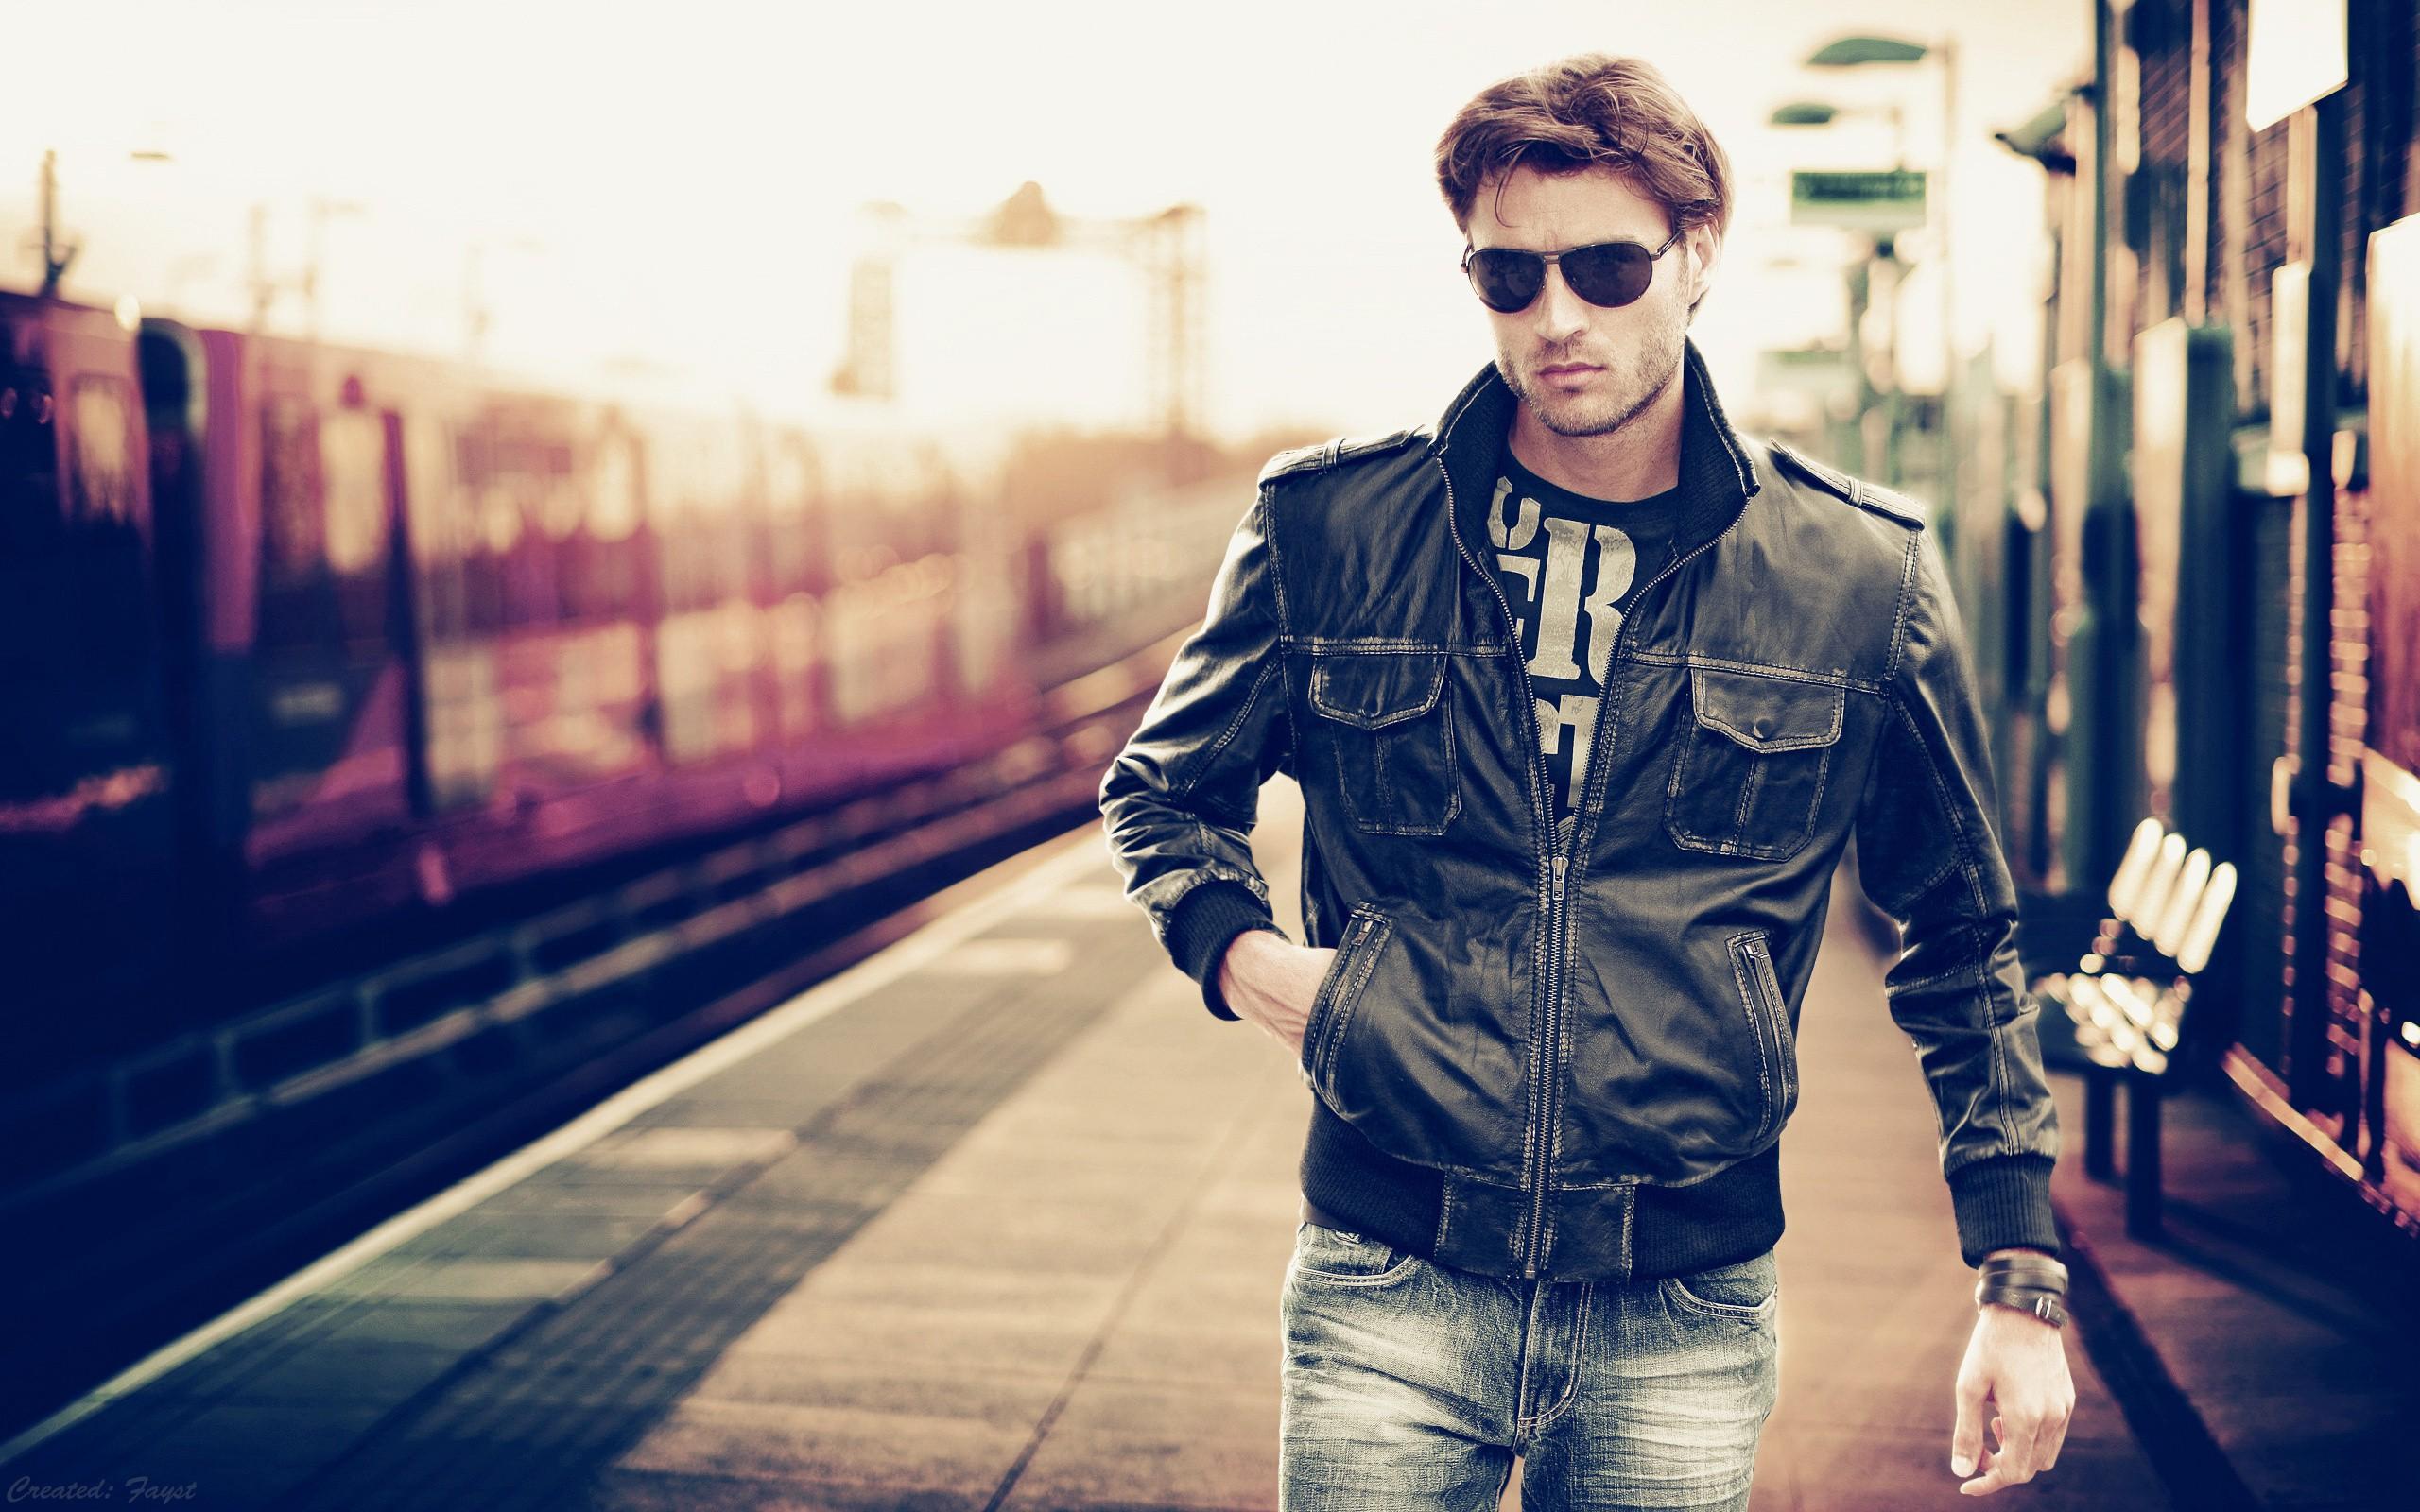 Models Men Sunglasses Train Stations Bokeh Leather Jacket